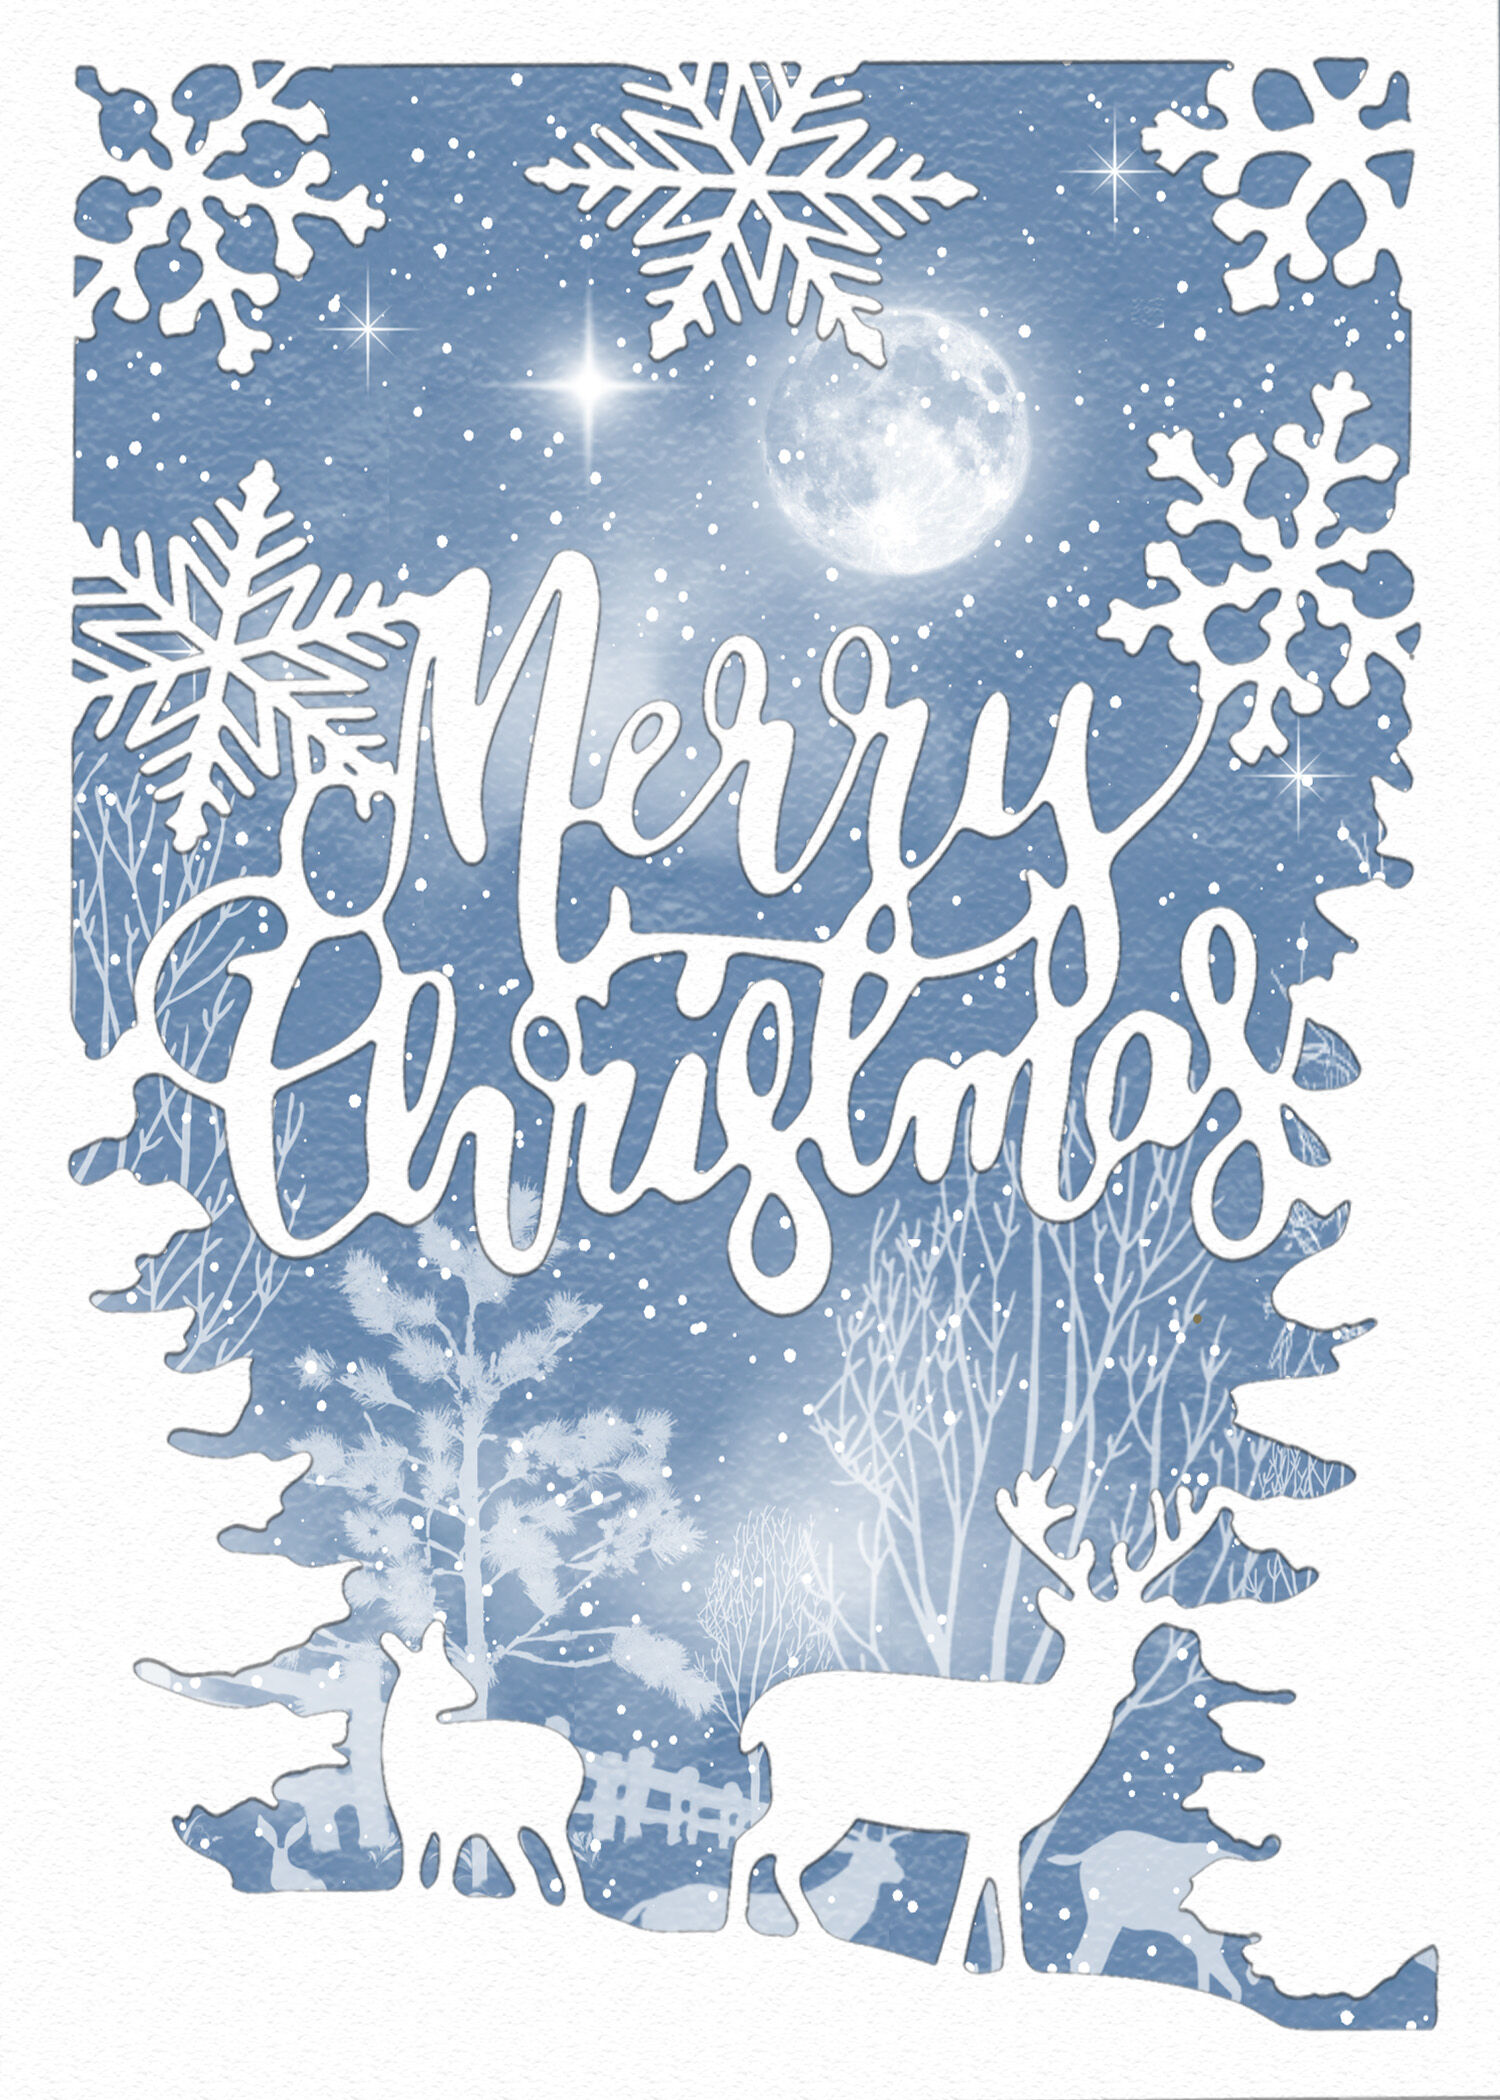 5 X 7 Merry Christmas Reindeer And Snowflake Christmas Card By